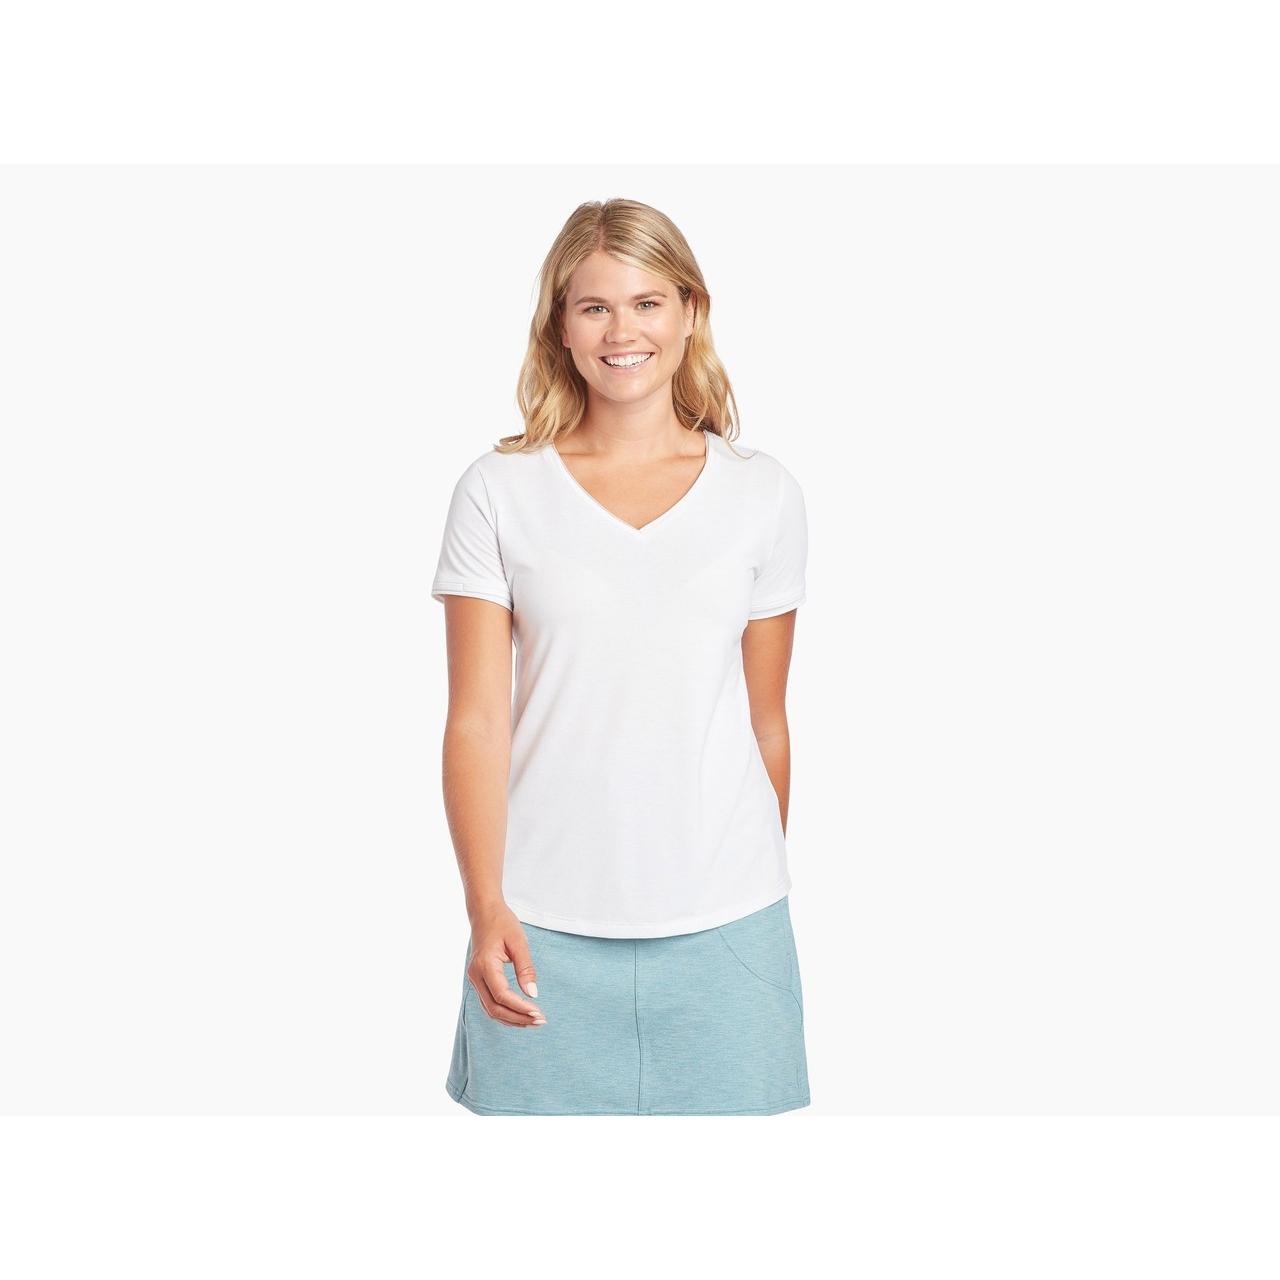 Juniper Short Sleeve - Women's